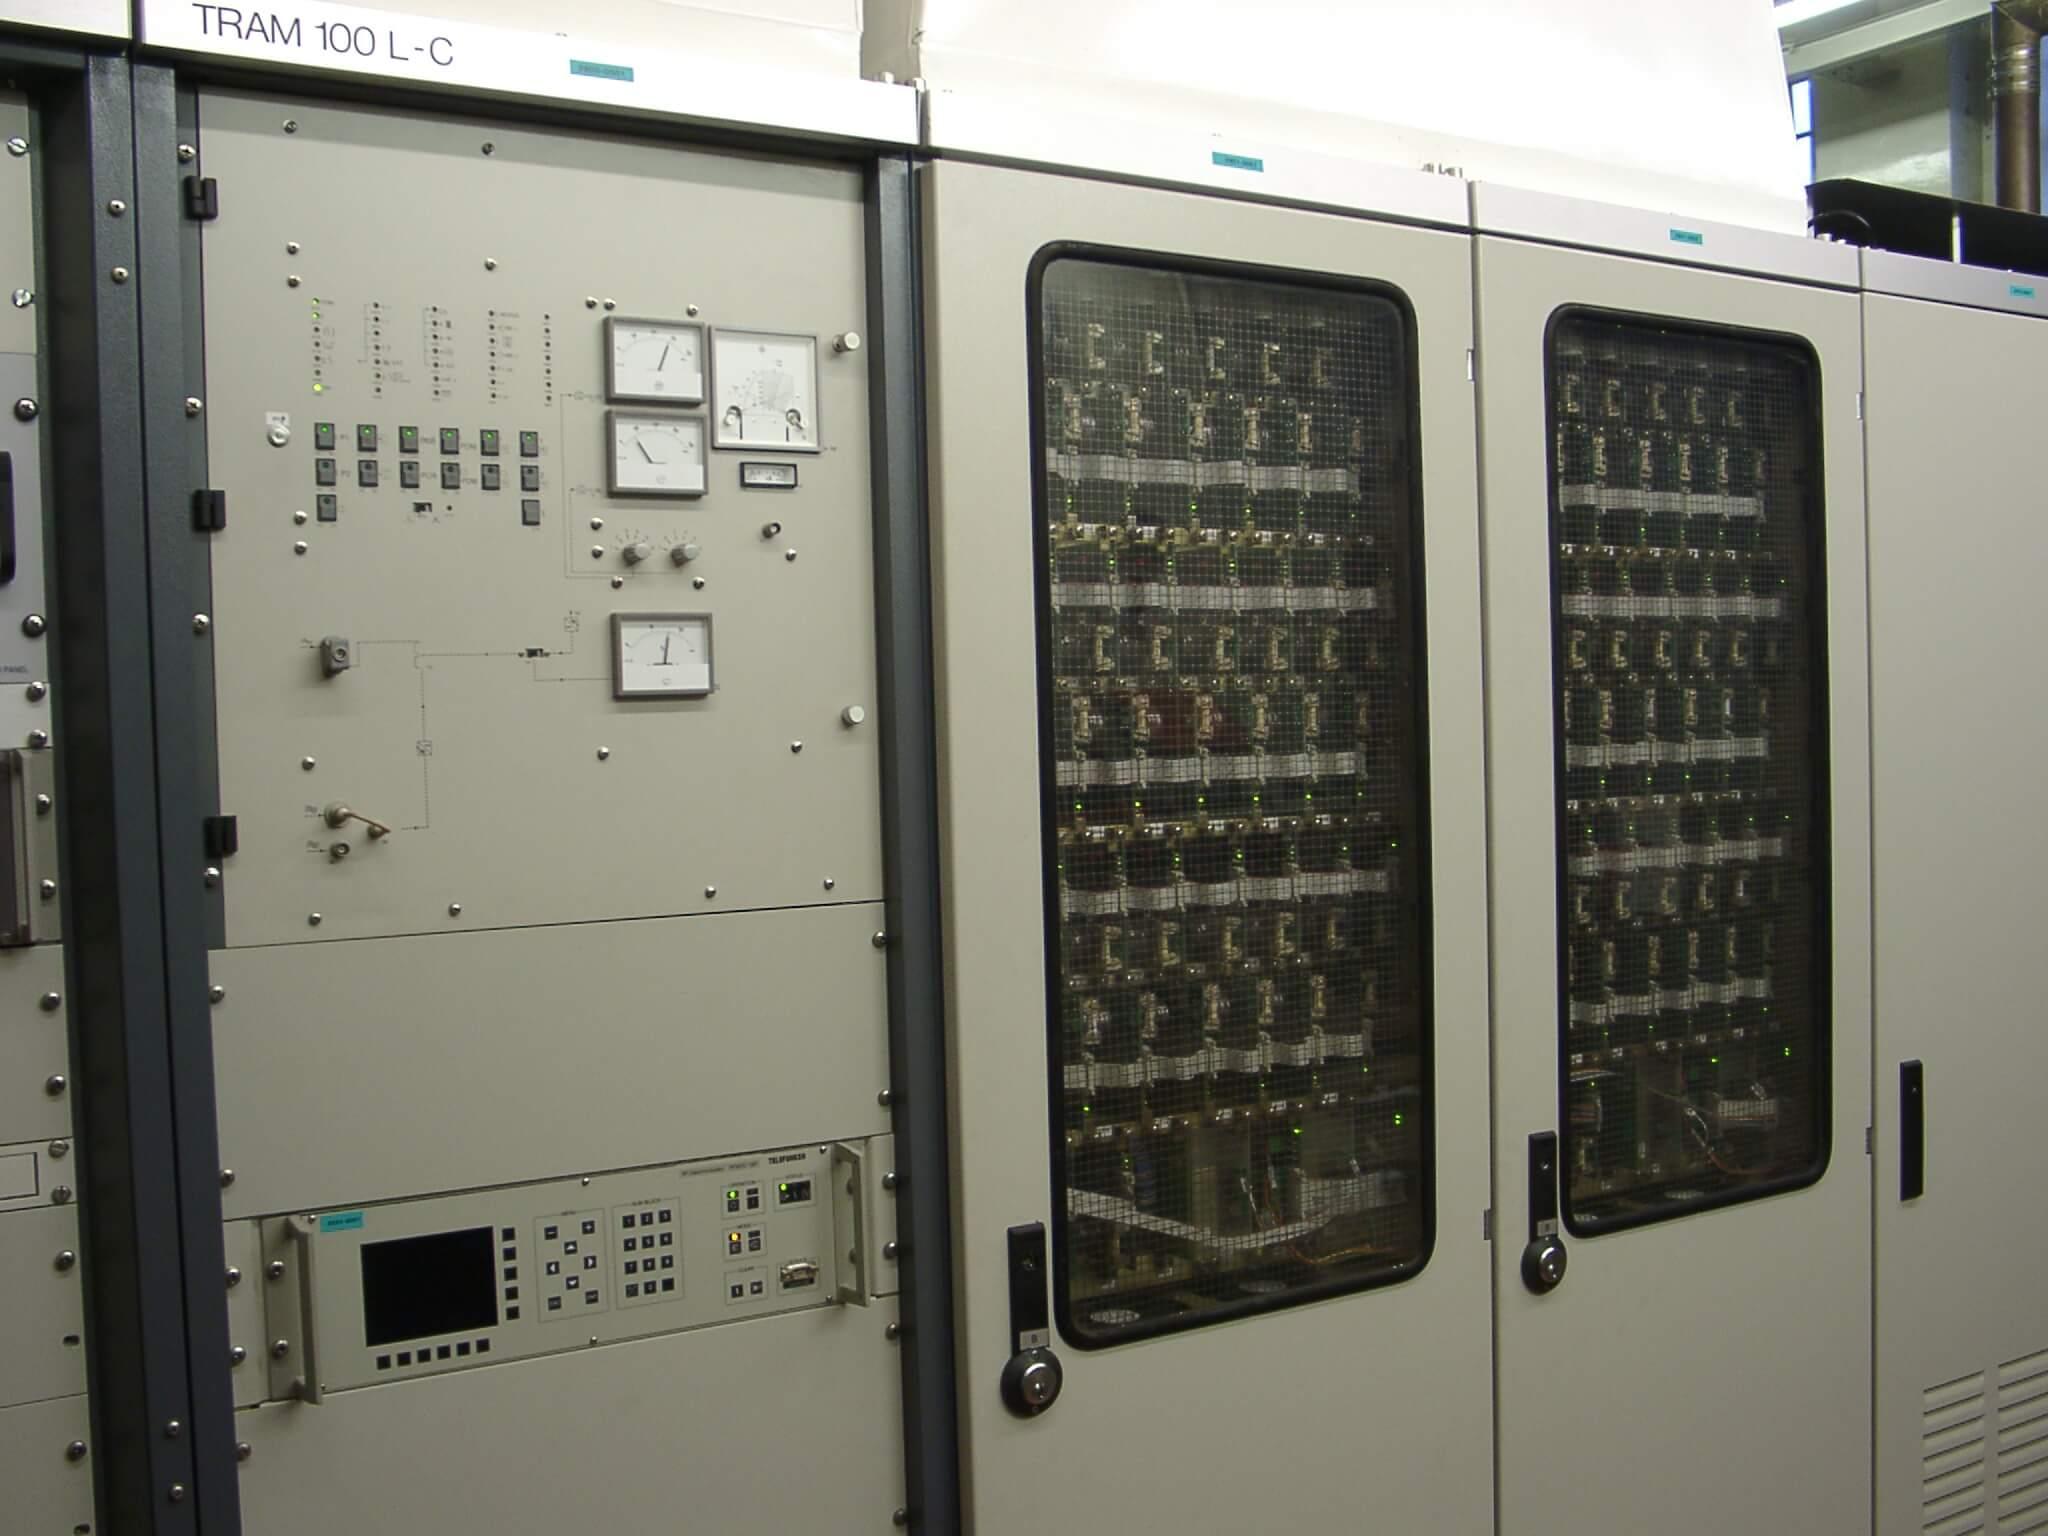 431 Final MSF Transmitter